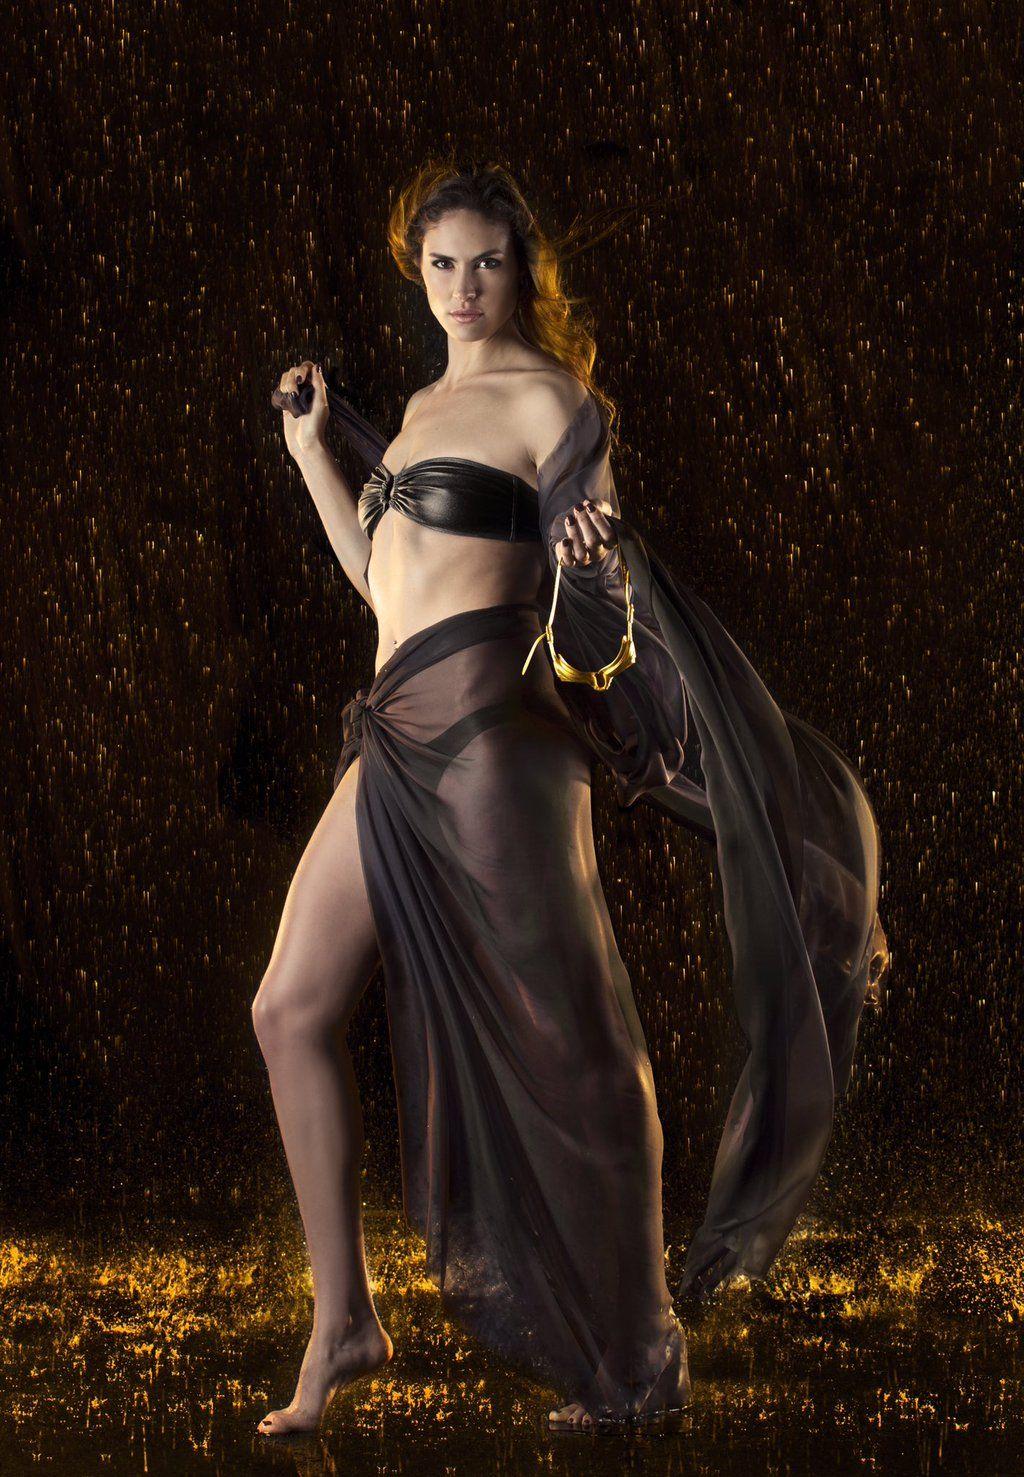 Celebrites Elodie Clouvel nudes (99 photo), Selfie